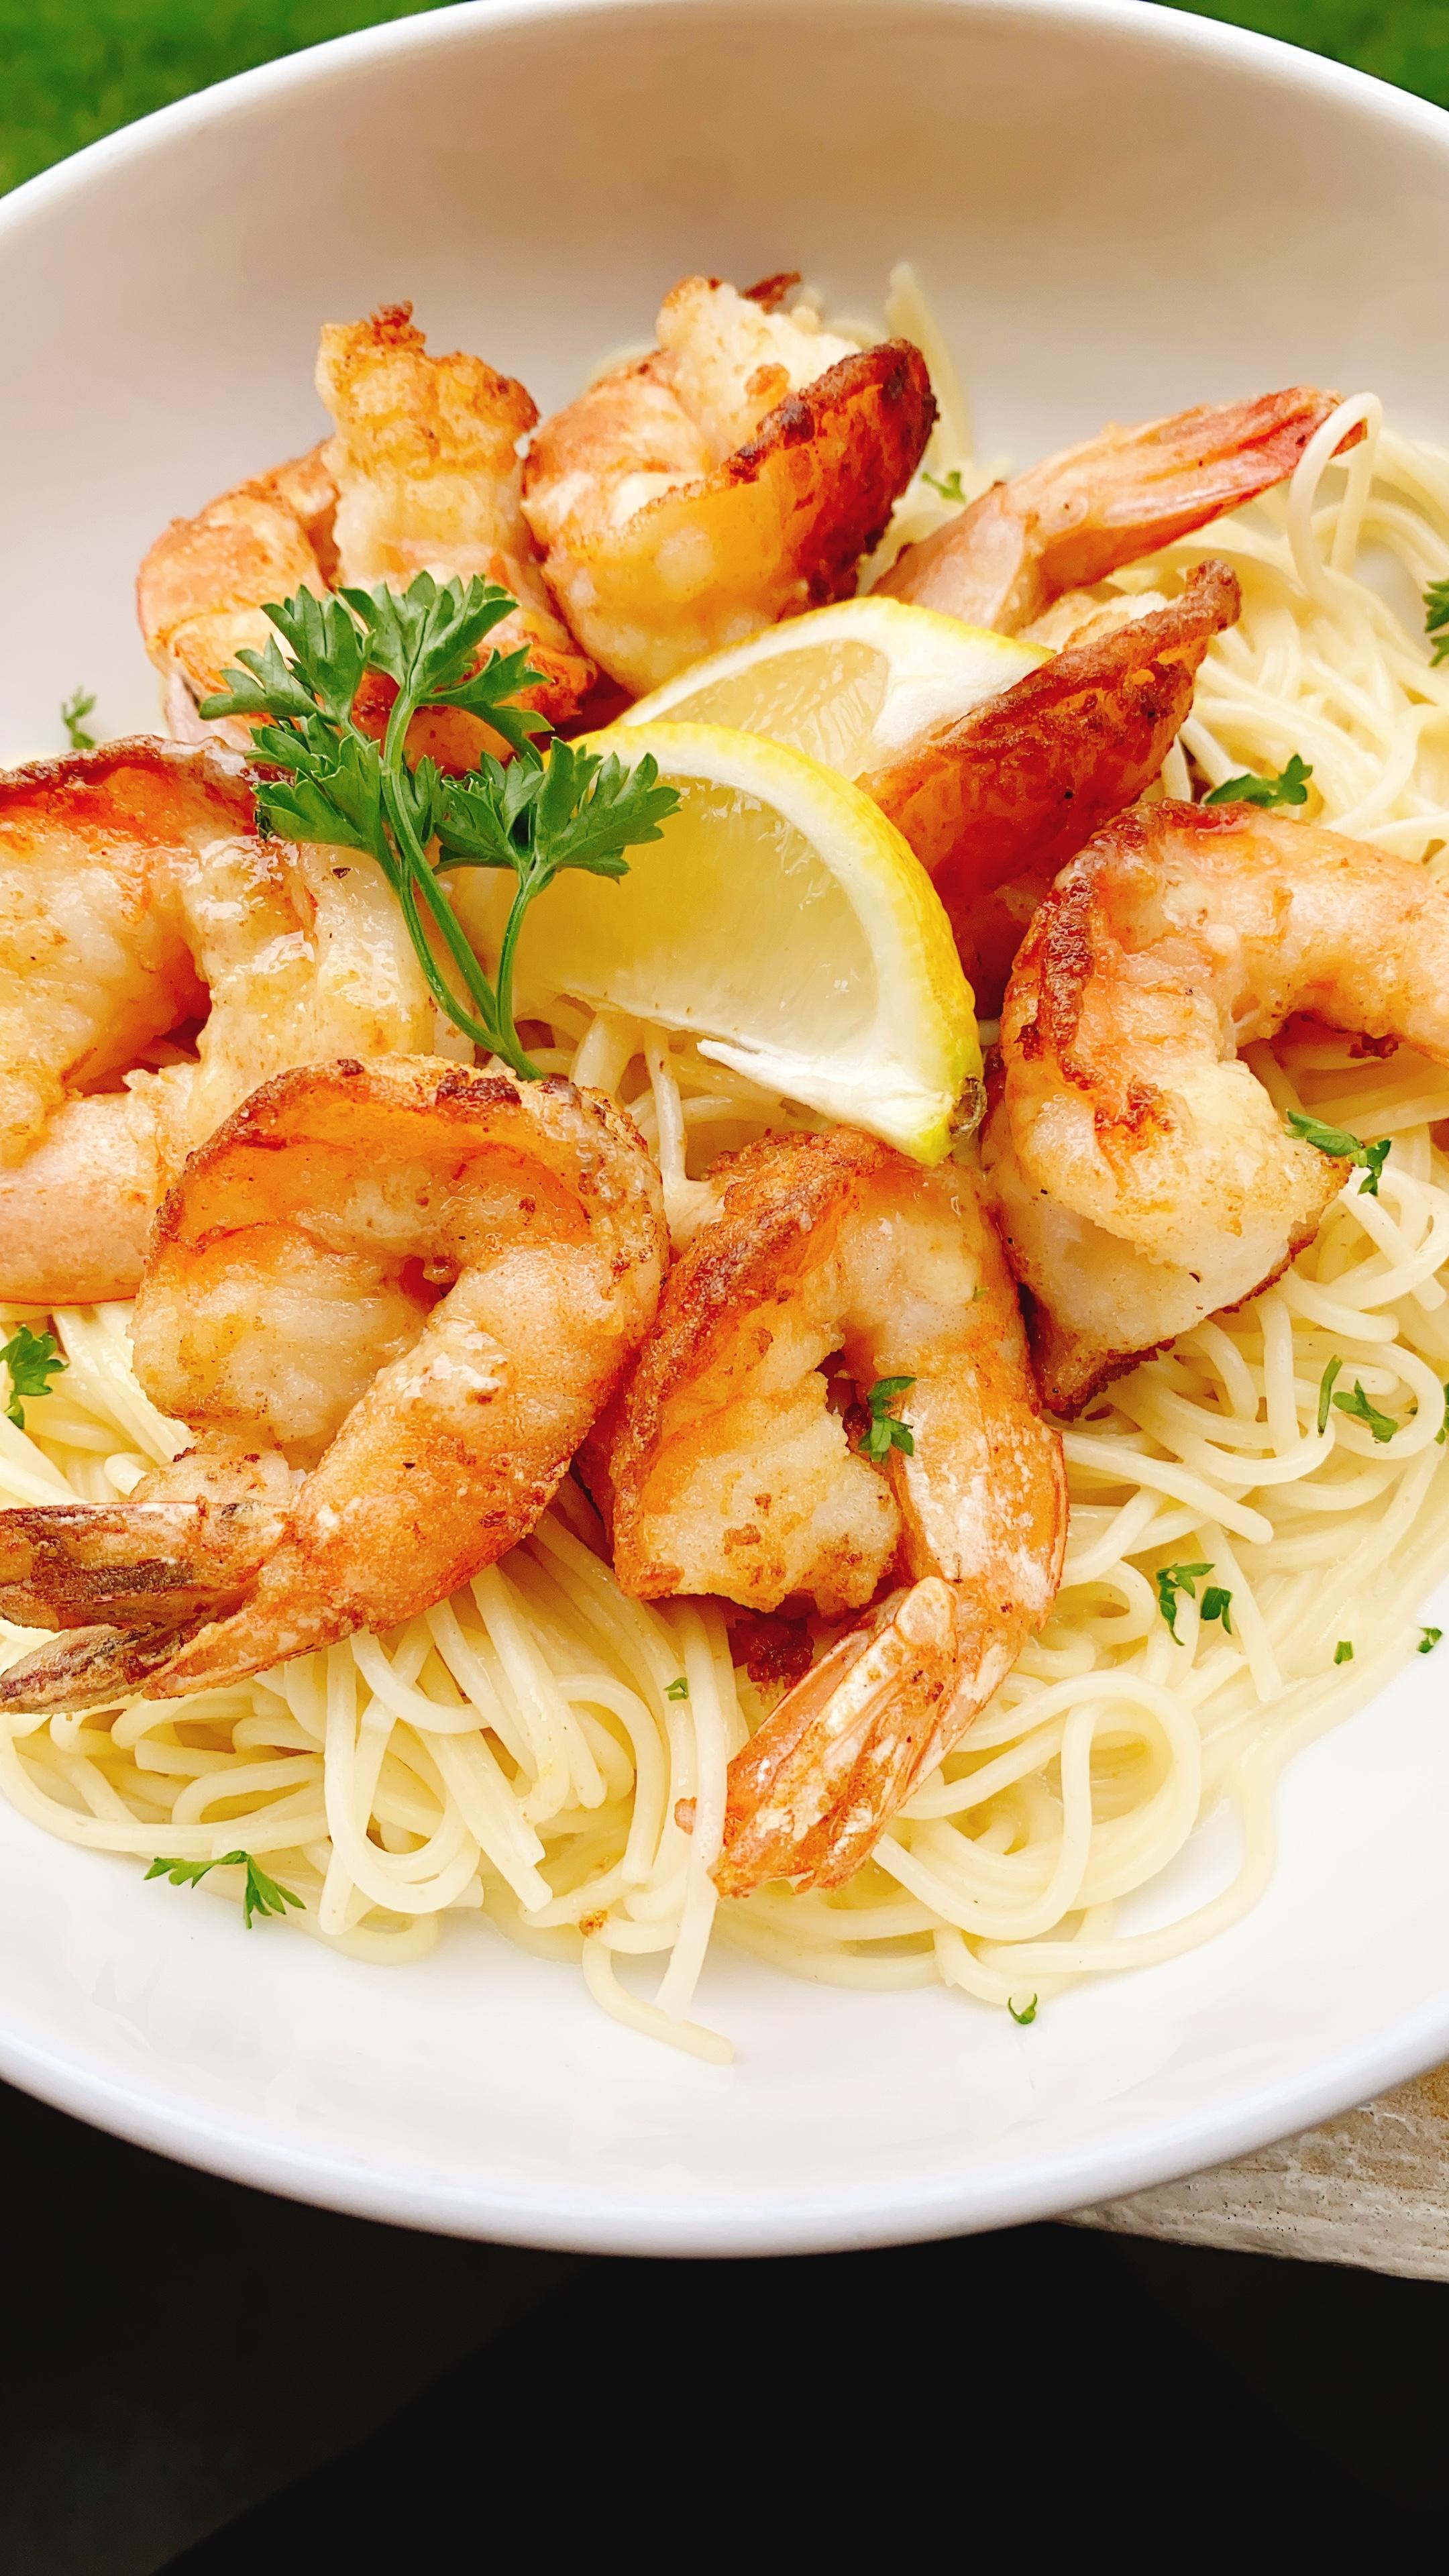 Date Night Shrimp Francese over Angel Hair Pasta